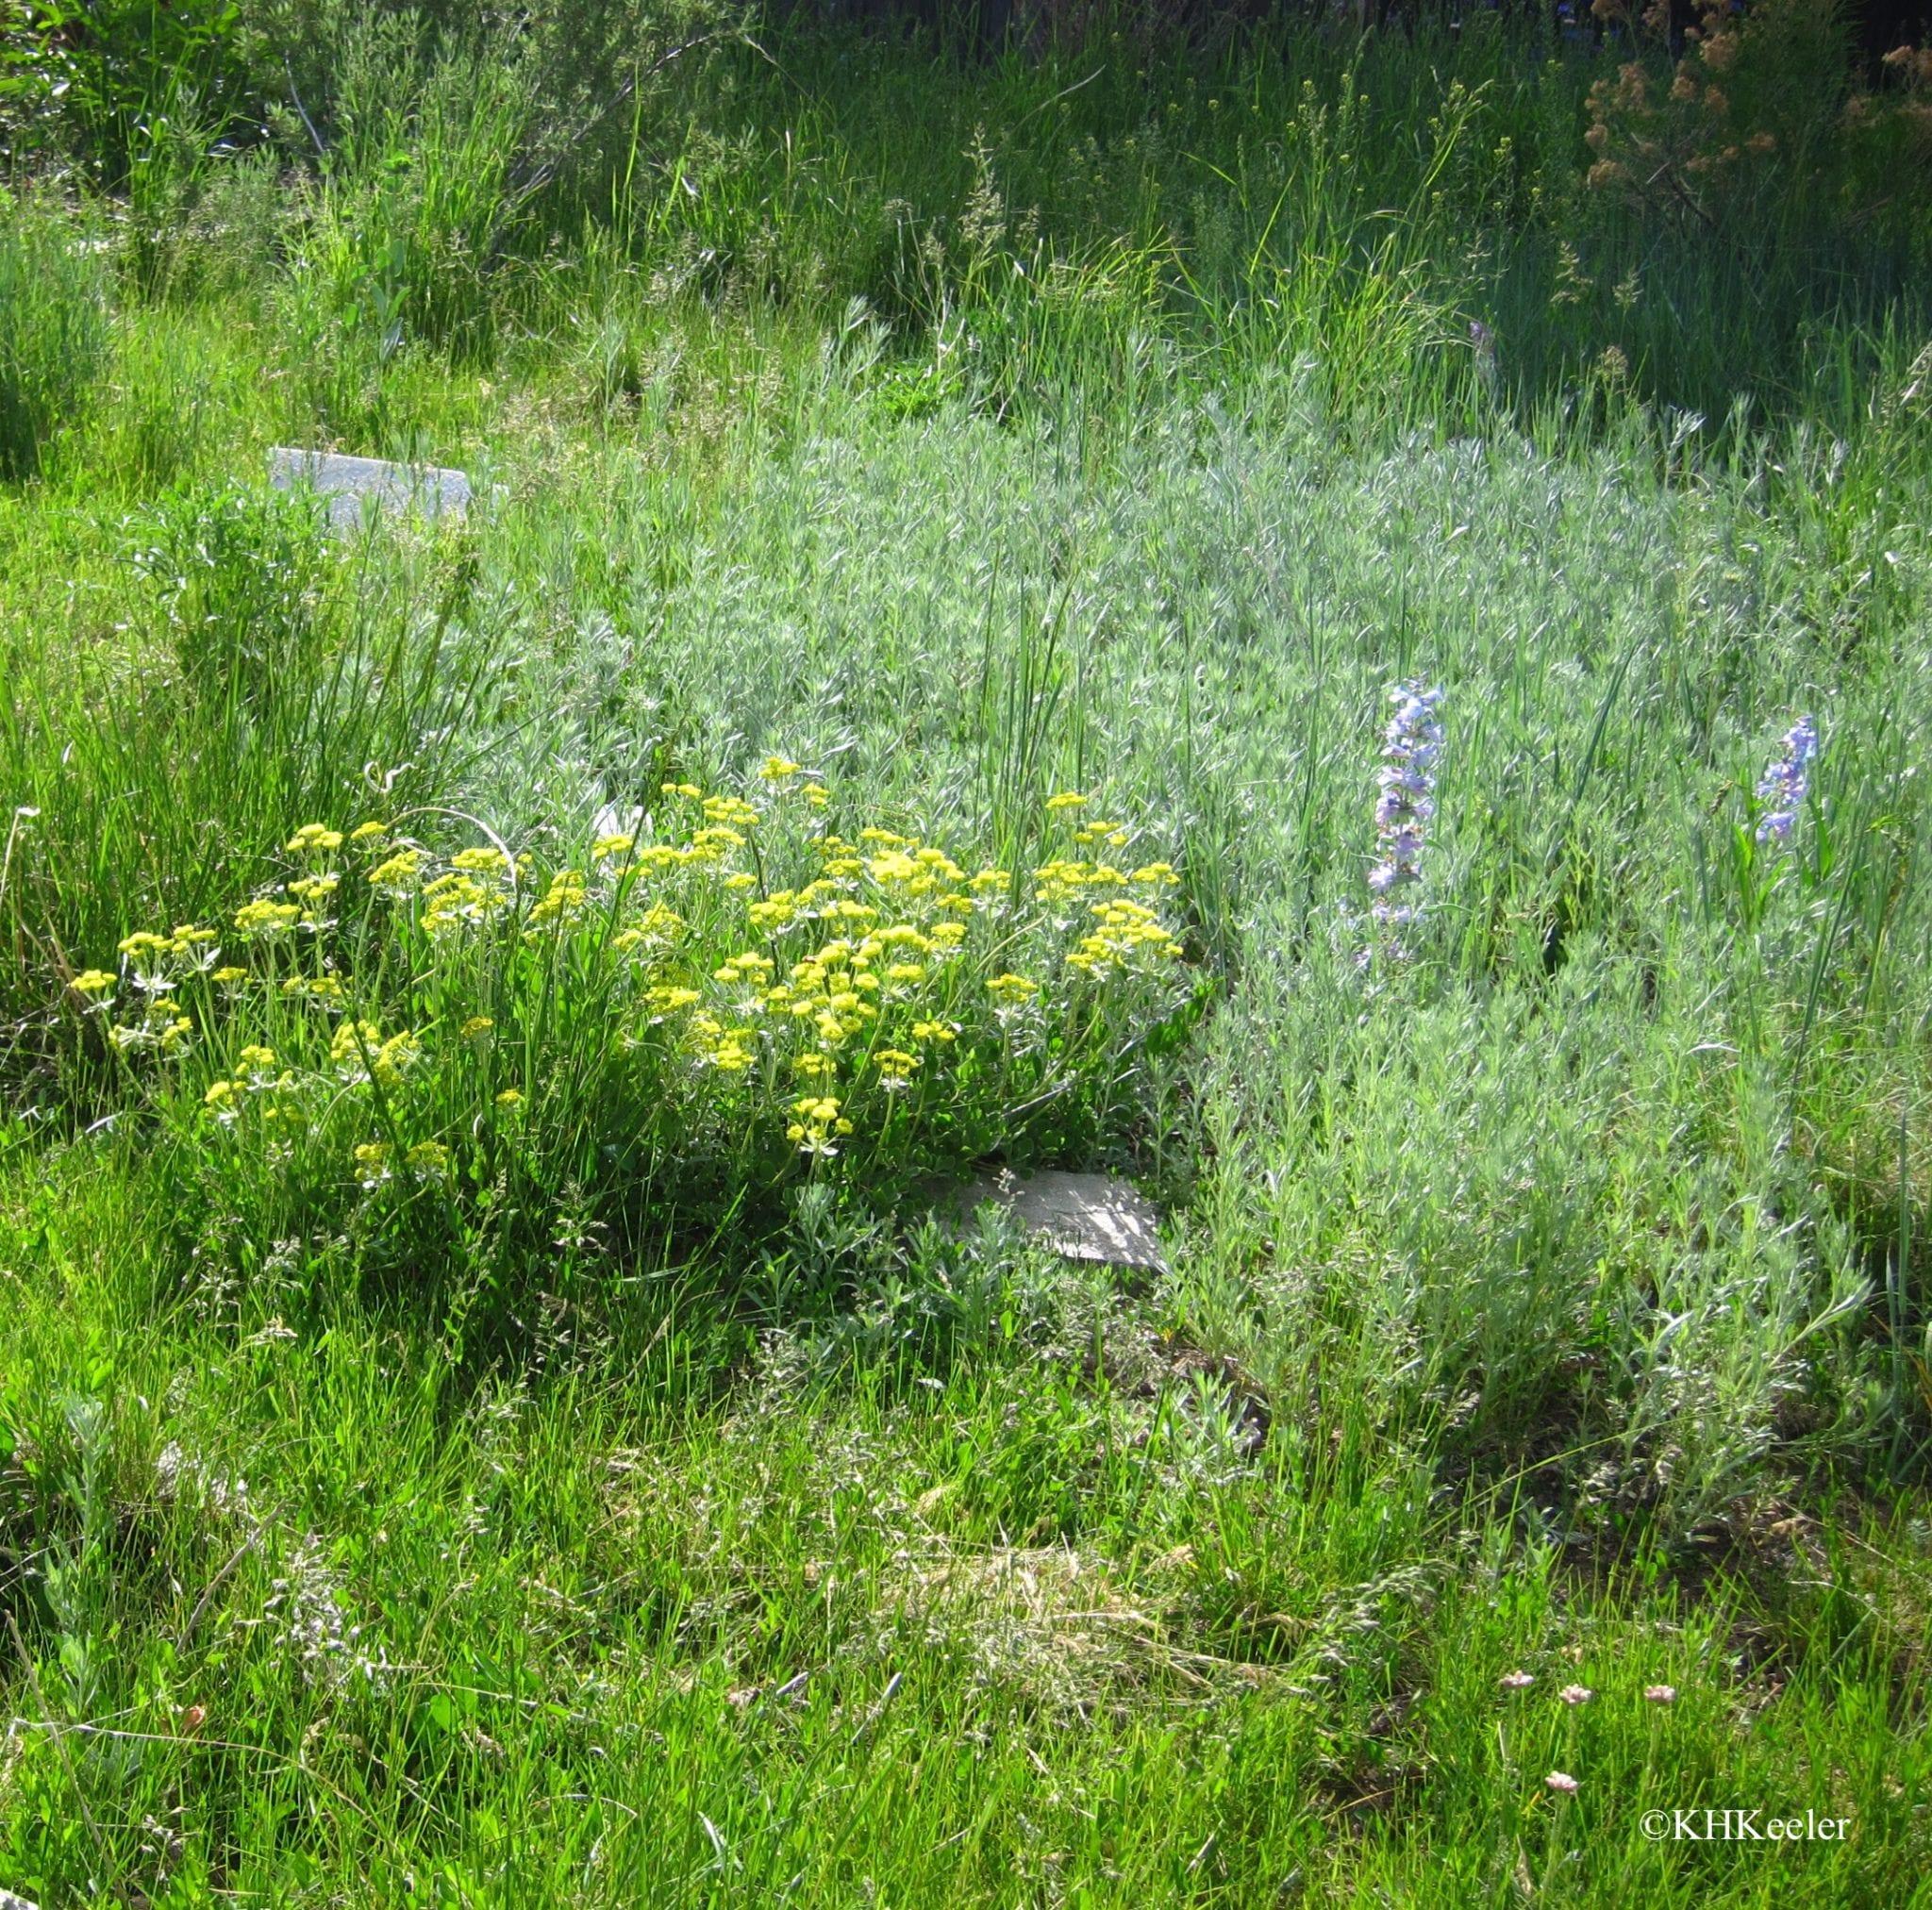 Grassland in spring